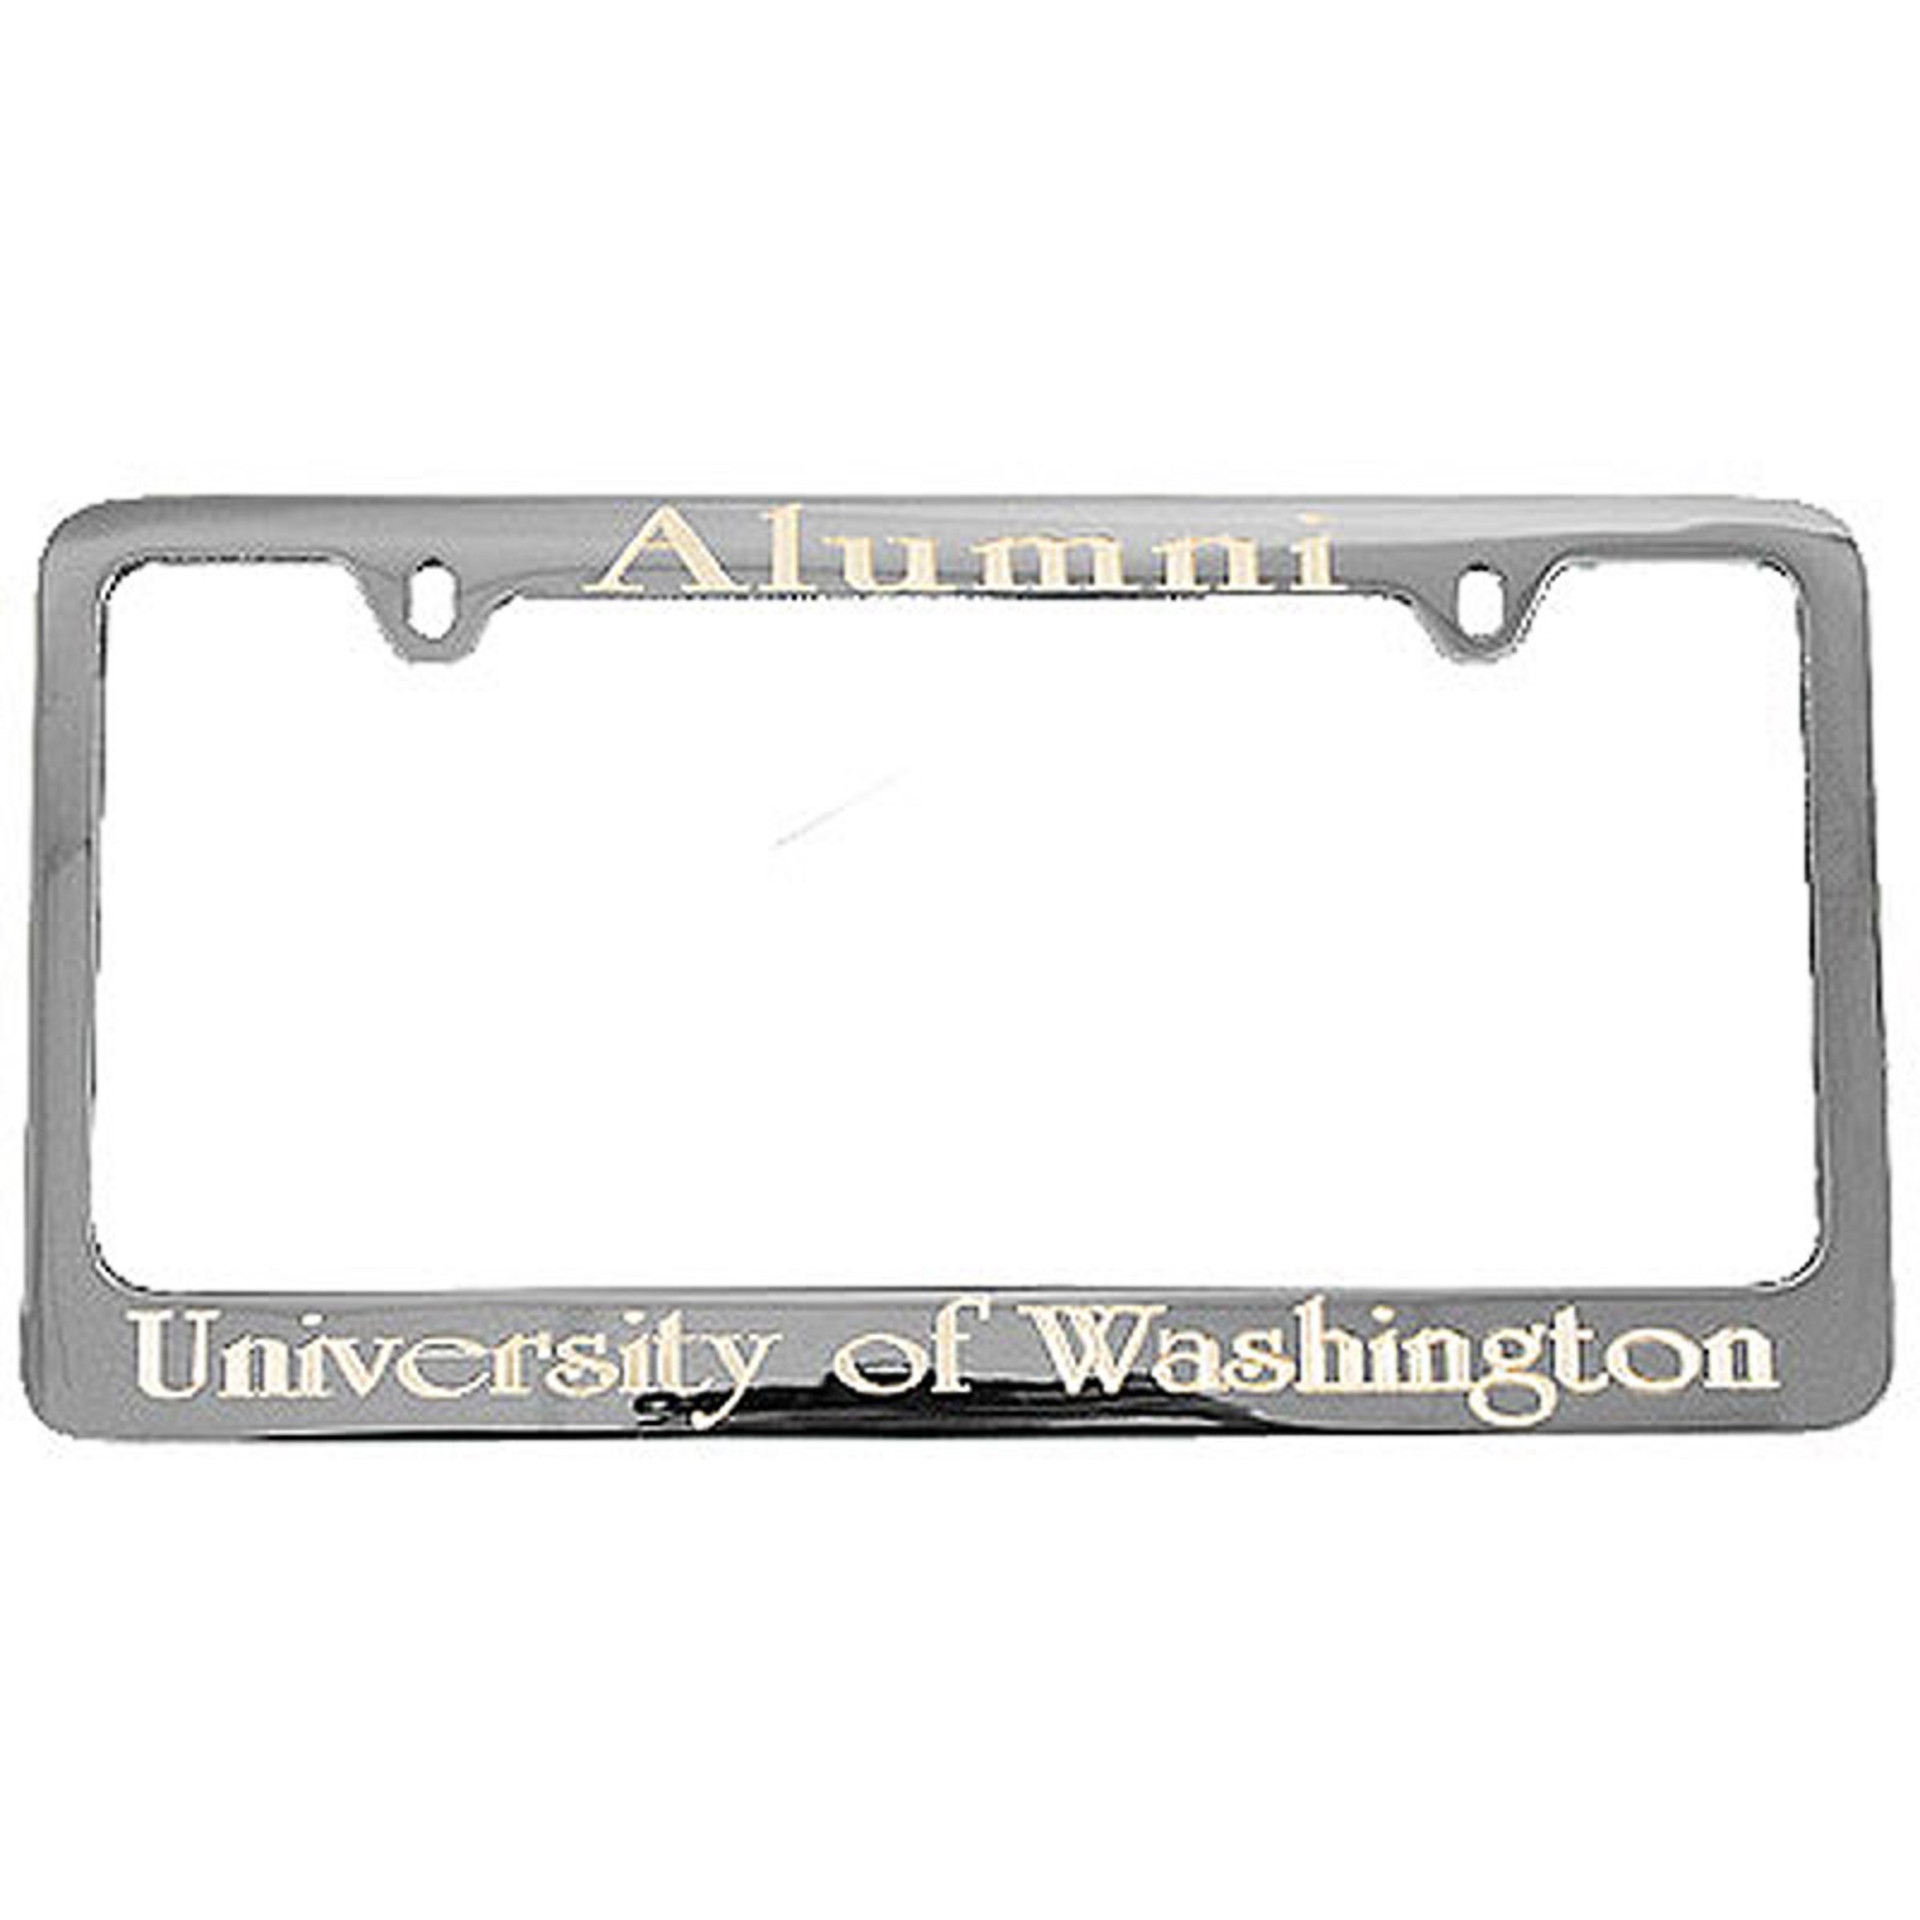 University of Washington Alumni License Plate Frame